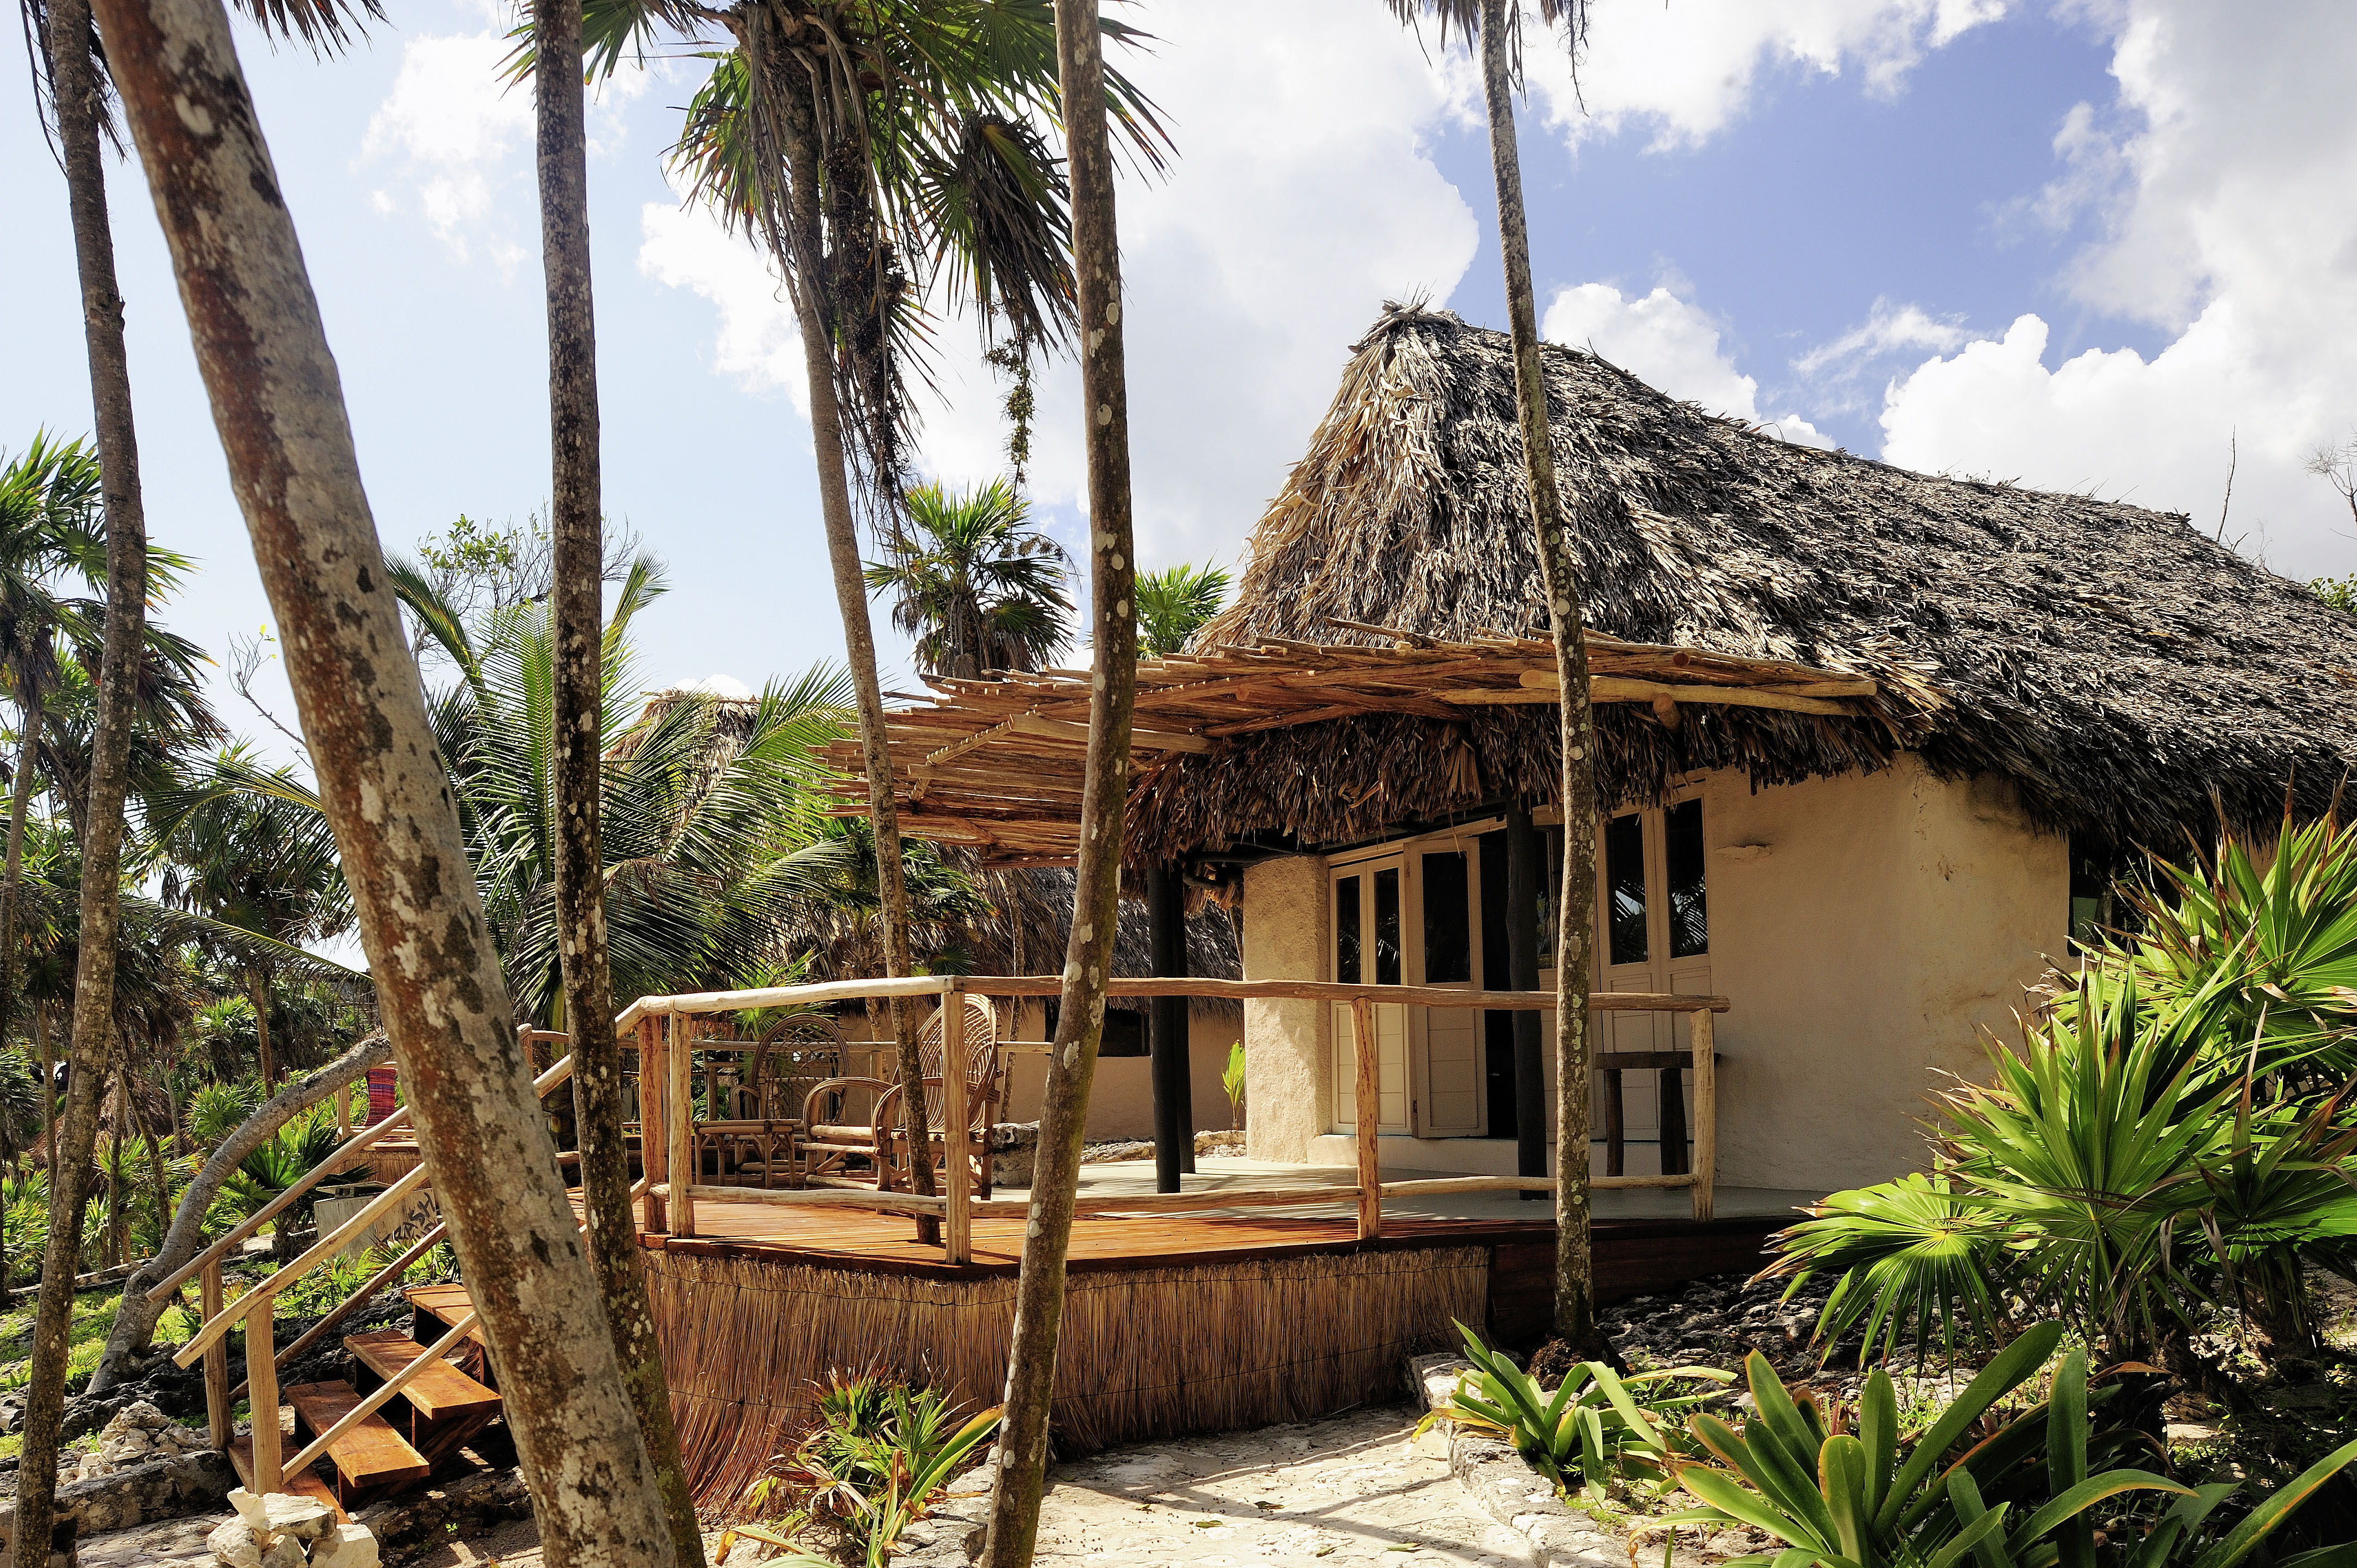 Beach Casita For Rent In Tulum Glamping In Mexico